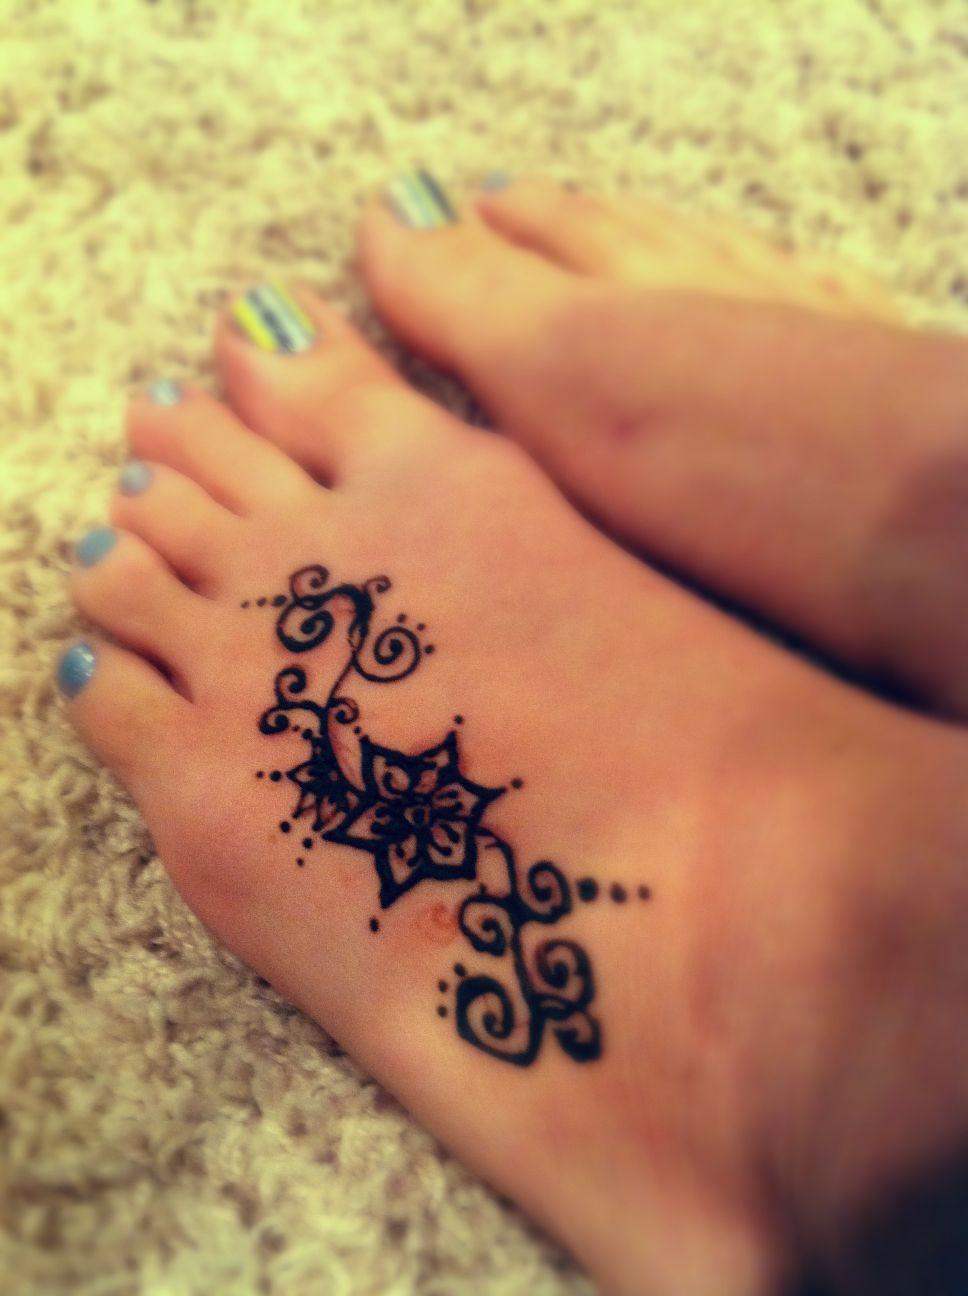 Pin By Alice Johnson On My Style Henna Tattoo Designs Simple Henna Tattoo Henna Tattoo Designs Simple